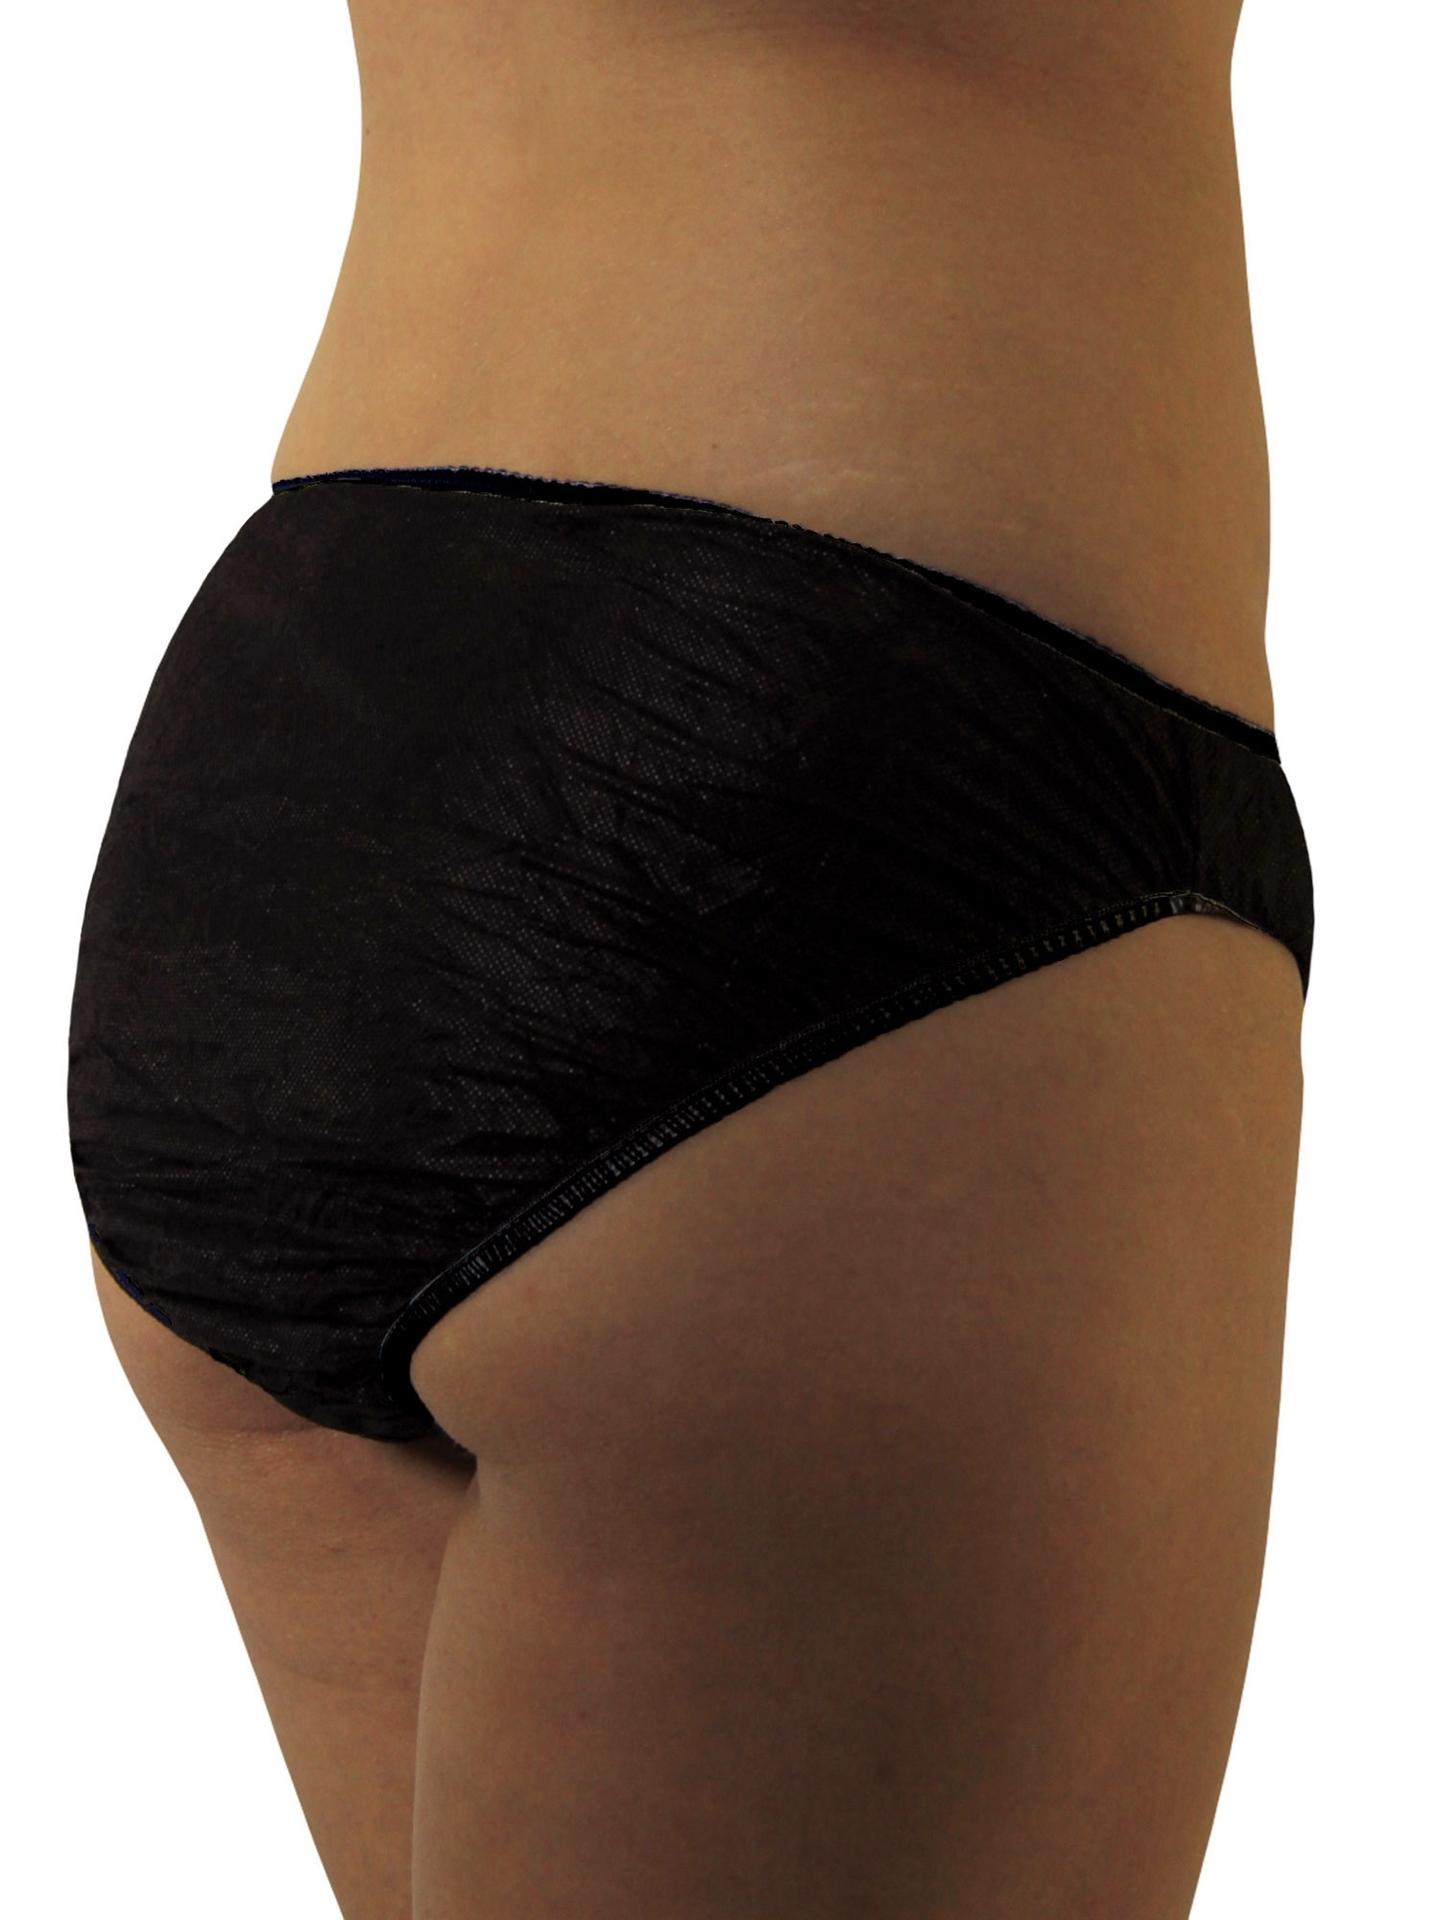 Underworks Black Health Disposable Underwear for women : Travel, Hospital, Spa